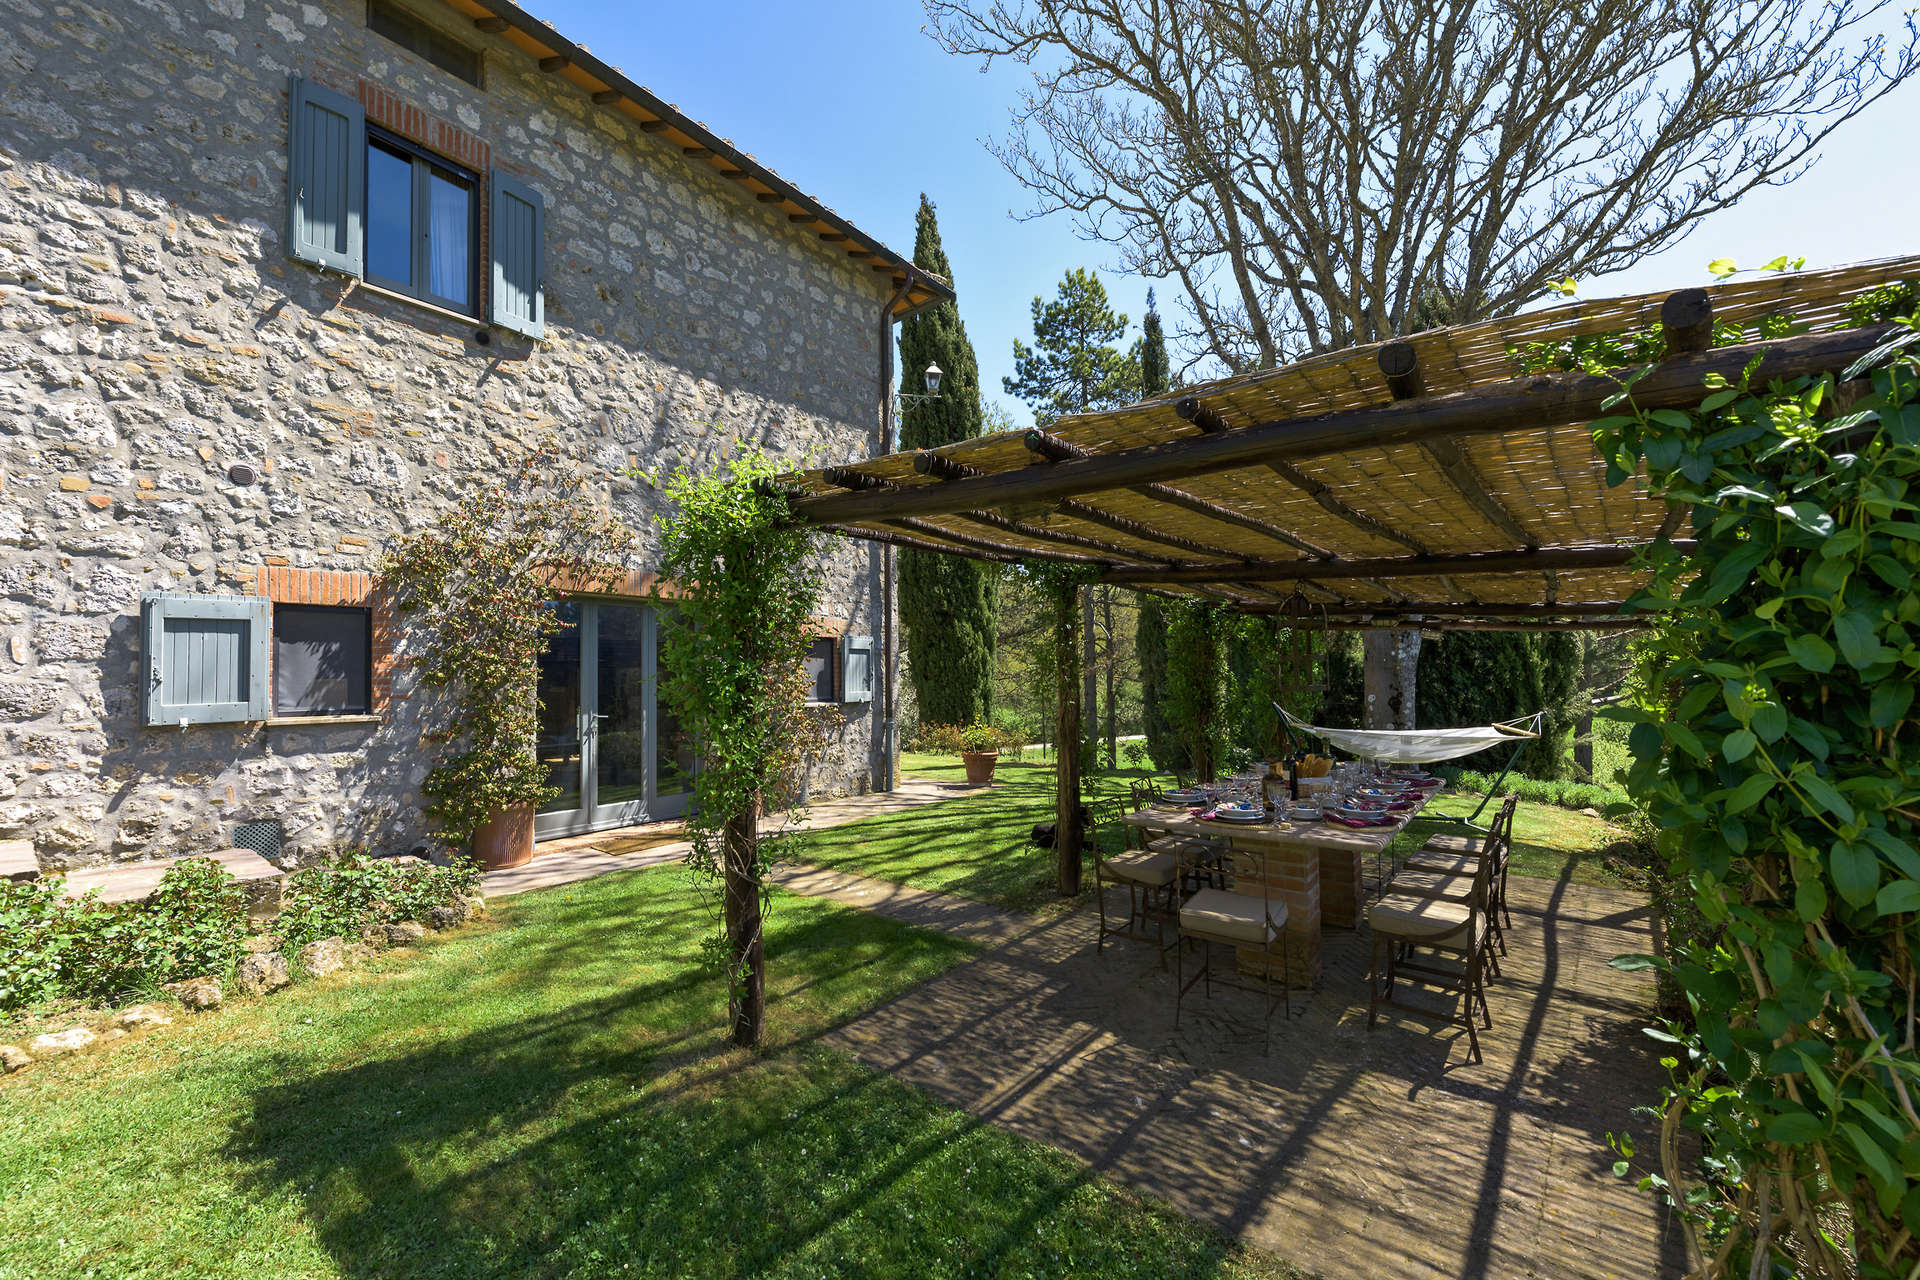 Luxury vacation rentals europe - Italy - Tuscany - Val dorcia - Aiola - Image 1/29